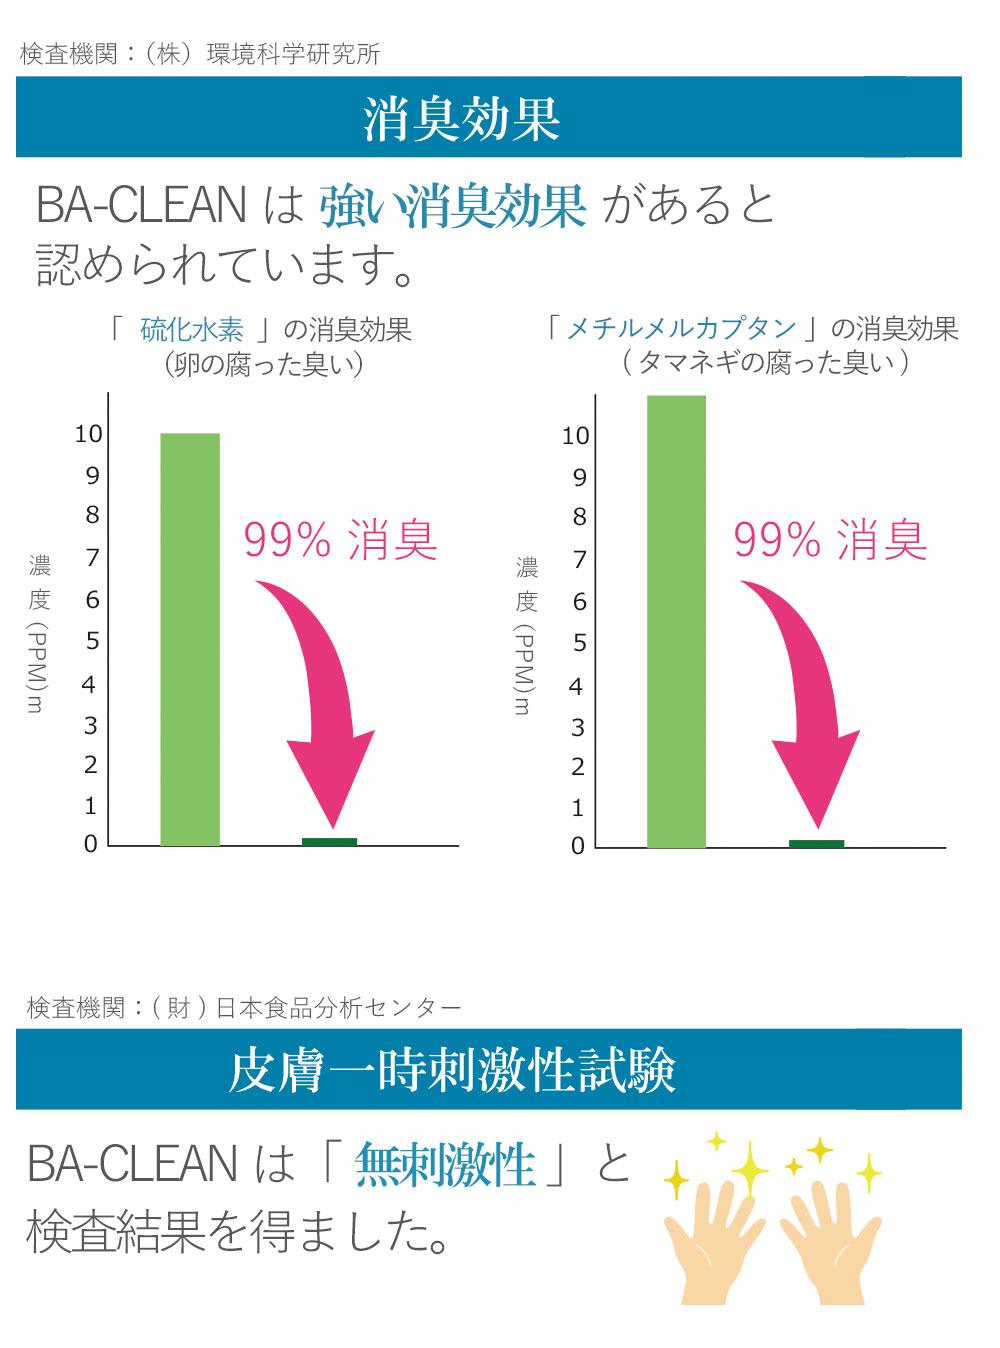 BA-CLEANは強い消臭効果・皮膚一時刺激性試験の結果は無刺激性」